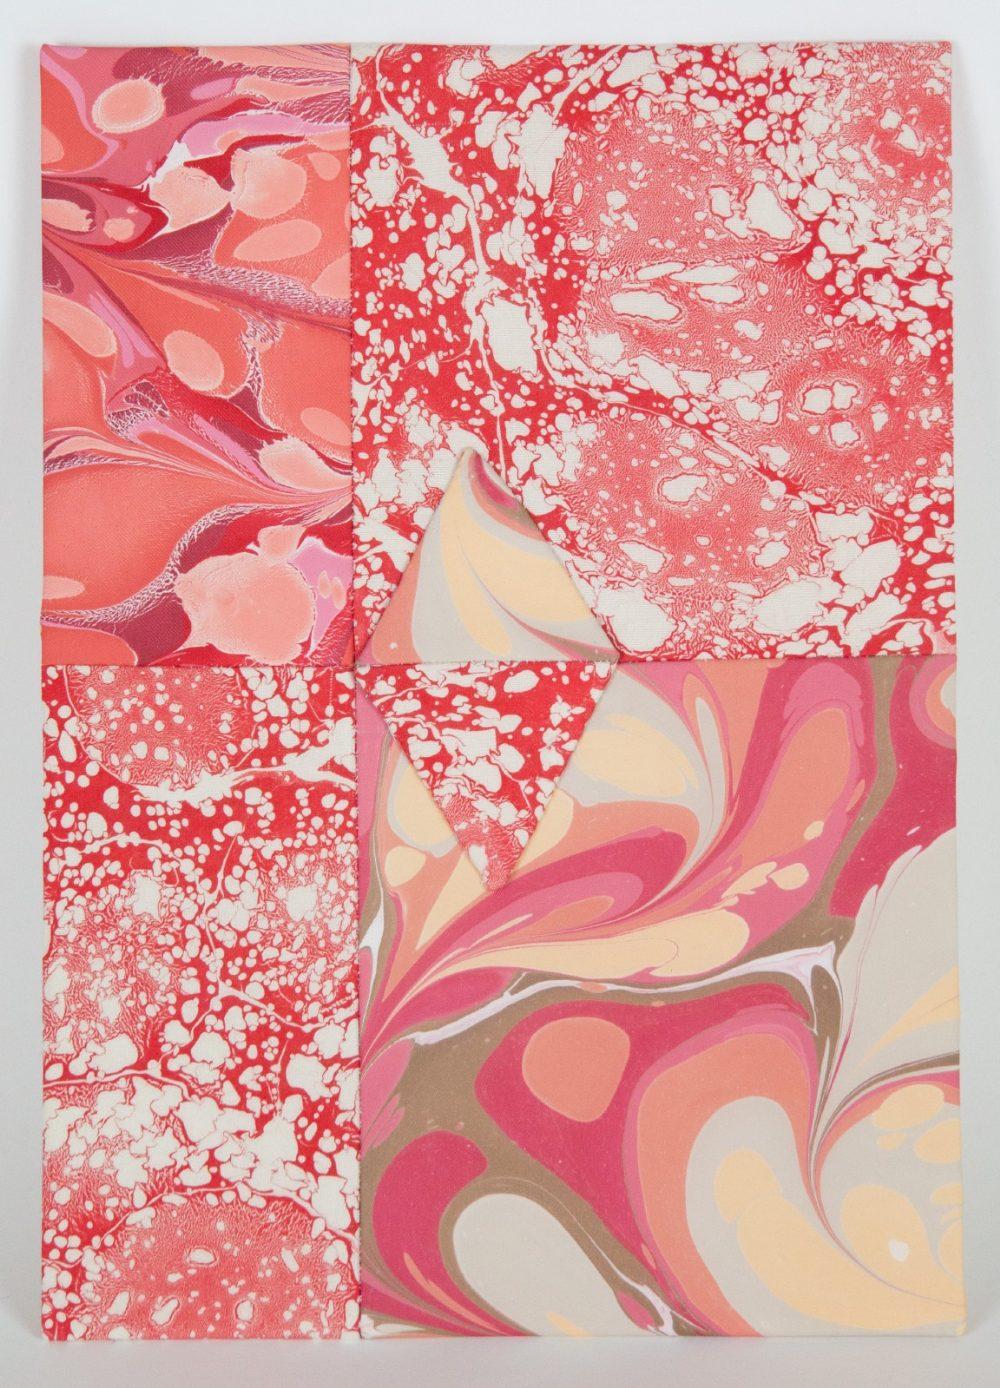 Emma D'Arcey (British). 'Ace of Diamonds', mixed media. 29.7 x 21cm. Emma's design practice